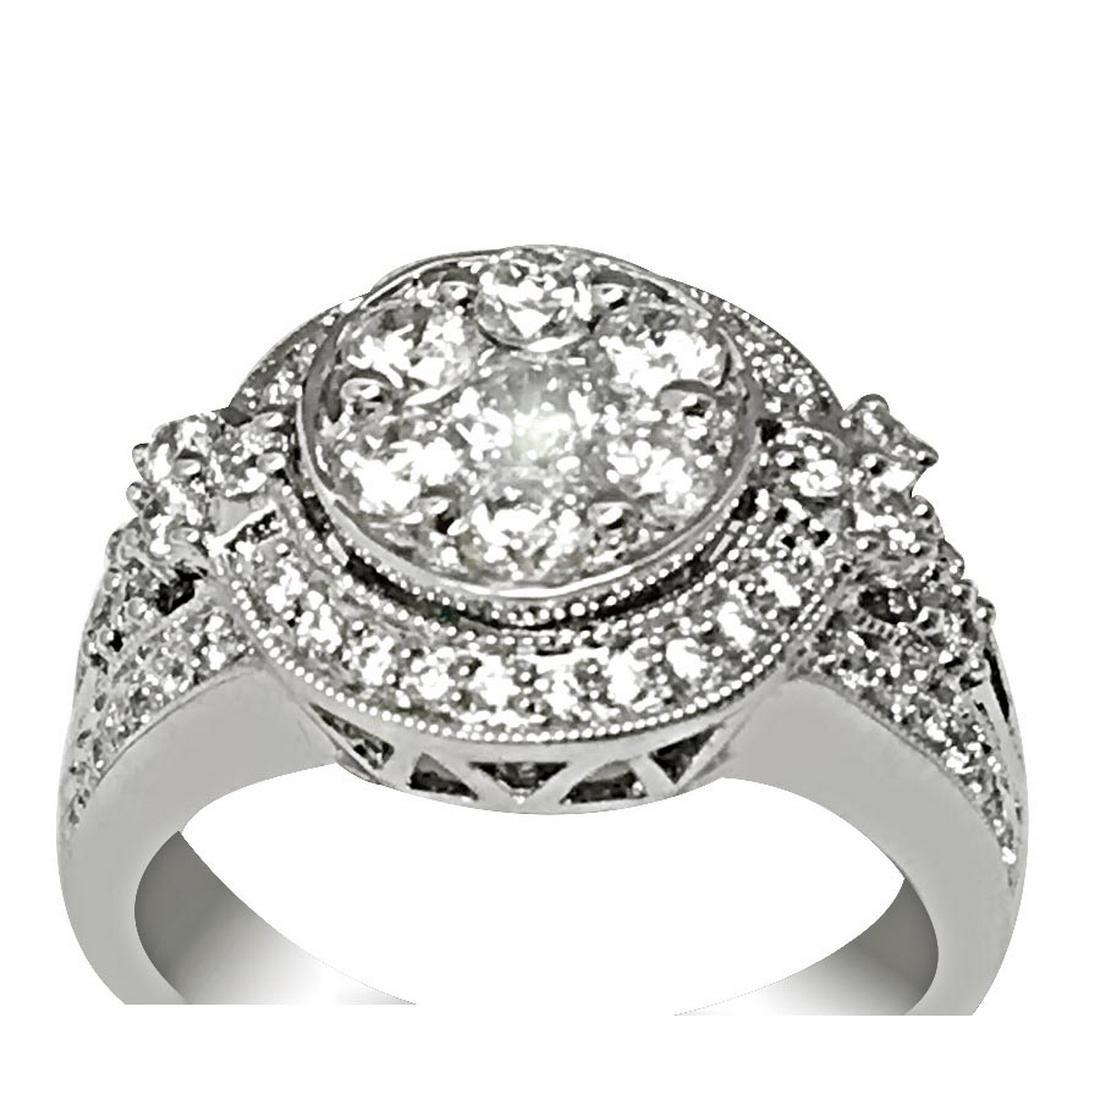 1.30 CTW DIAMOND RING IN 14K WHITE GOLD G-H/SI1-SI2